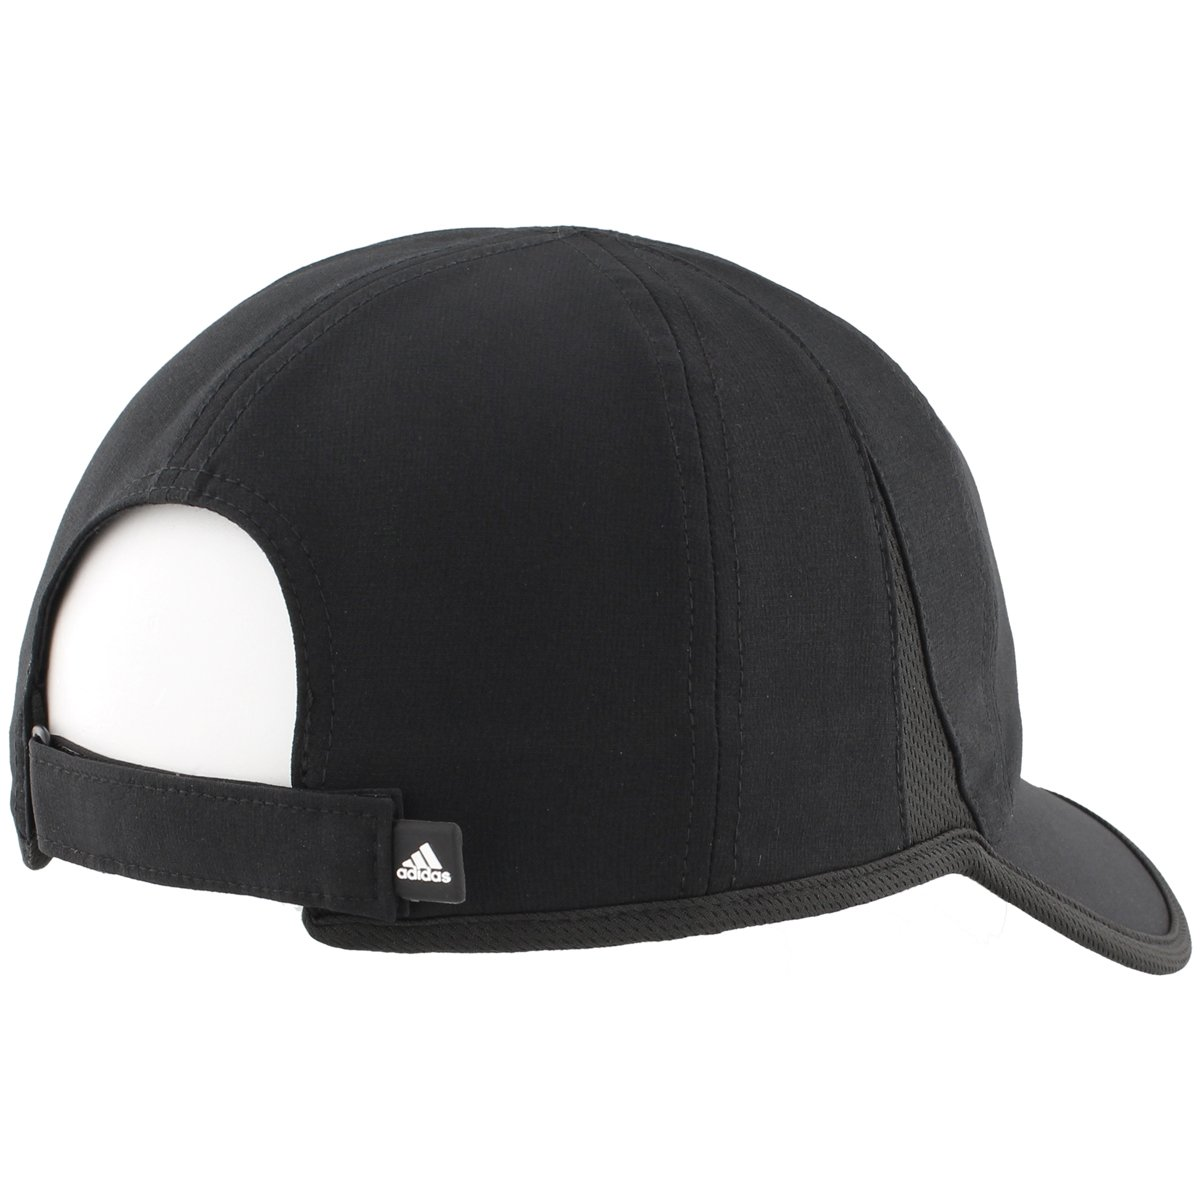 Adidas Men s Blend Baseball Cap CI0524 Black  Amazon.in  Clothing    Accessories 3ba213e18f3b